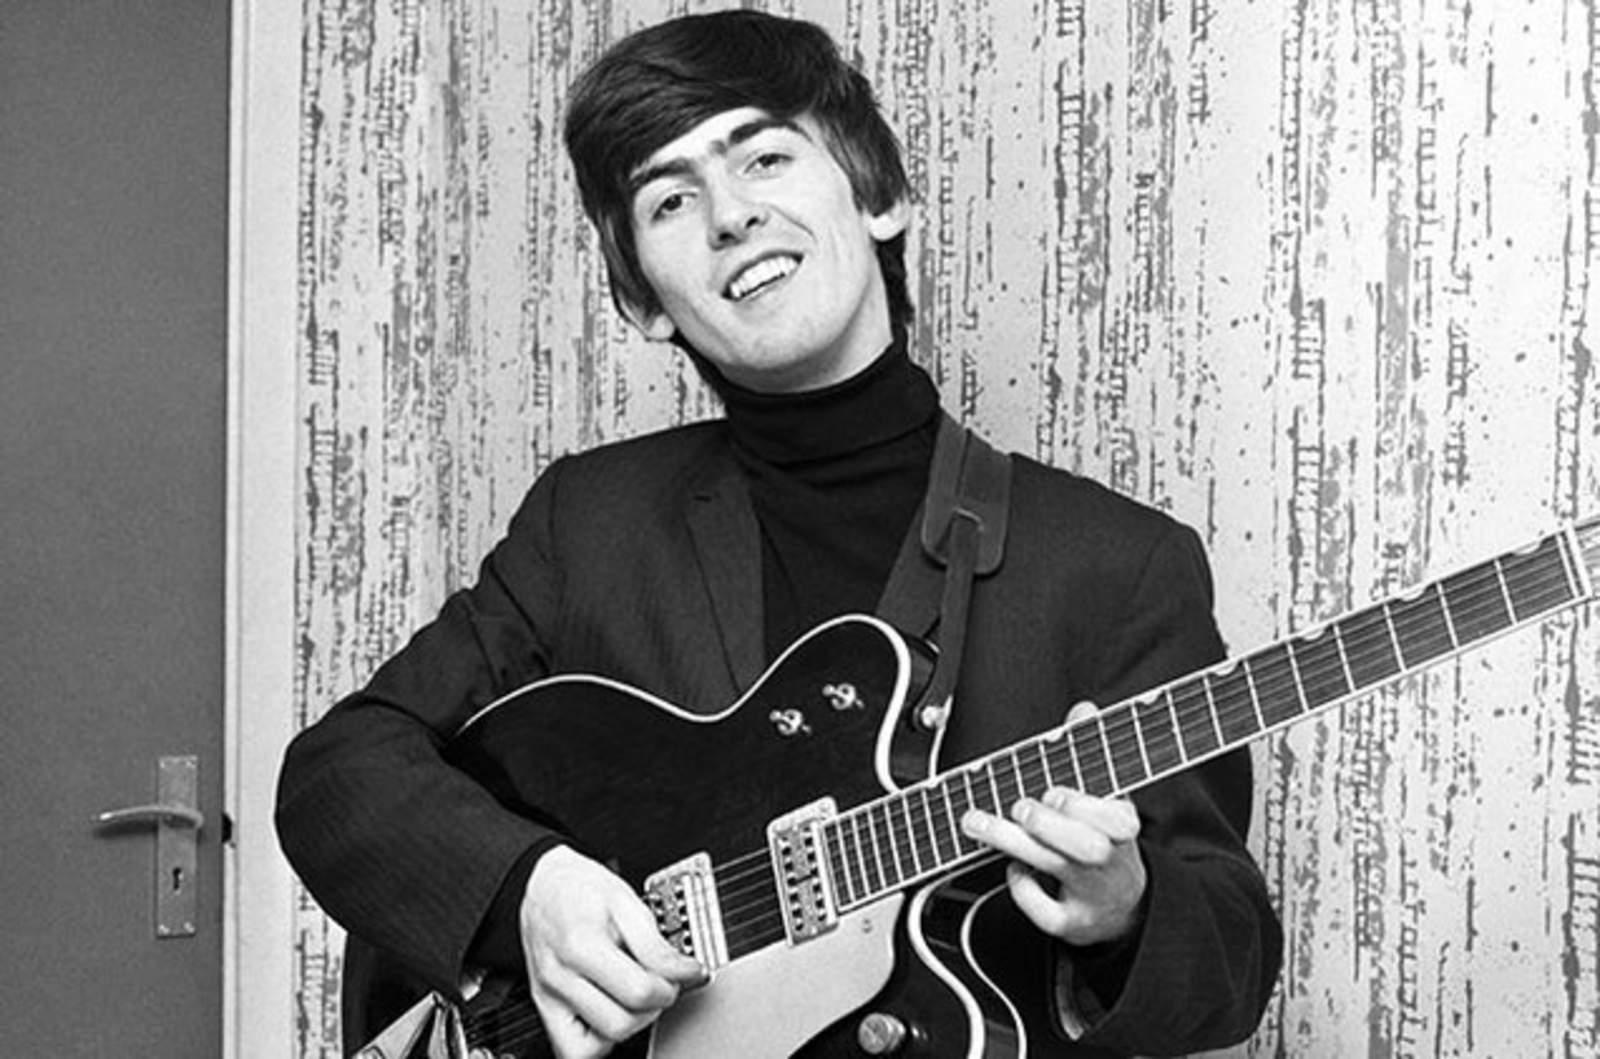 Subastarán guitarra usada por George Harrison en 1959